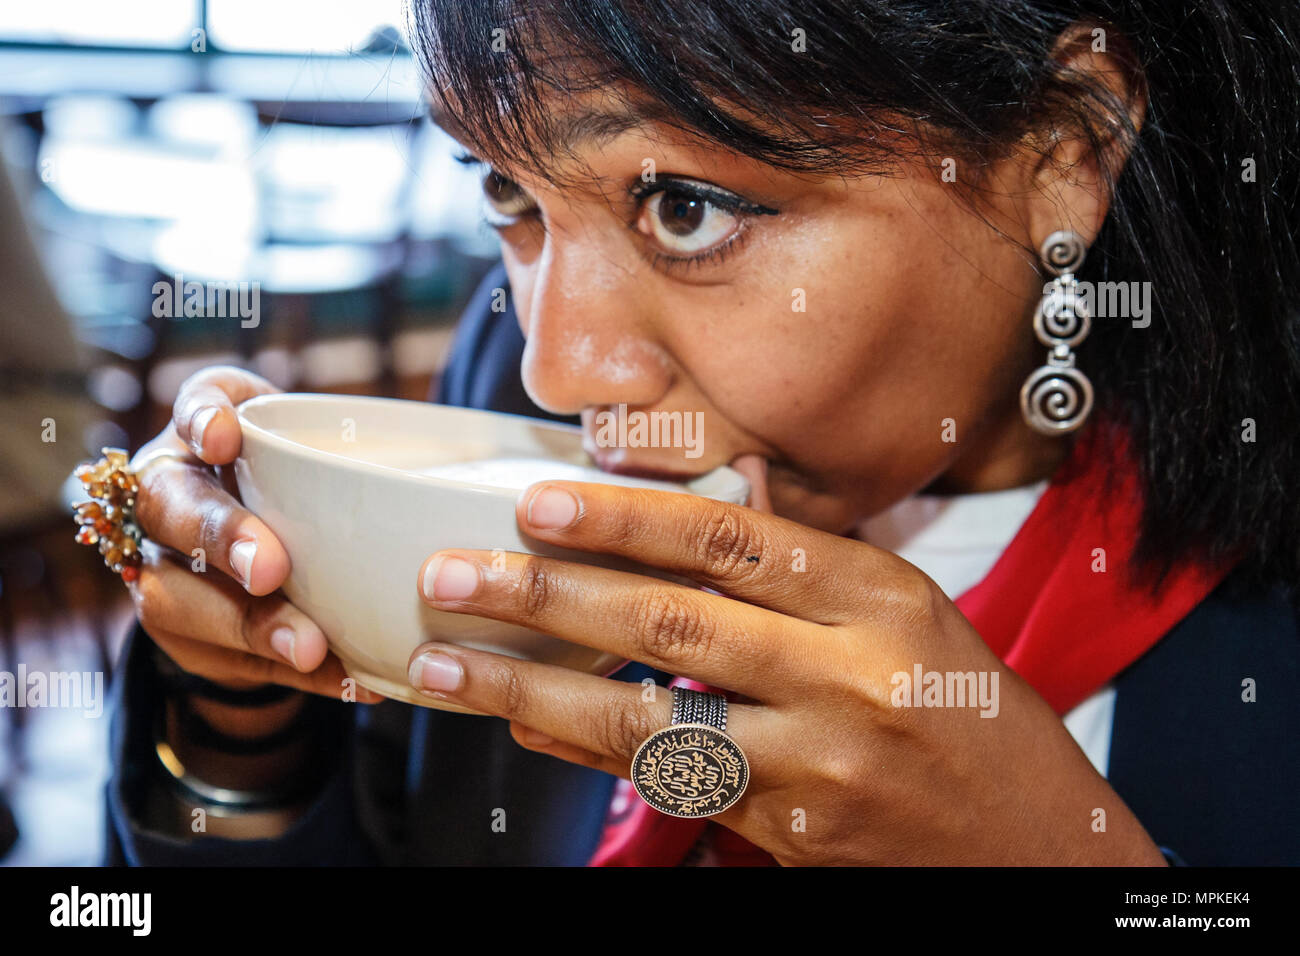 Montreal Canadá Atwater, Boulangerie Premiere Moisson negro mujer bebe café latte café tazón de leche Imagen De Stock